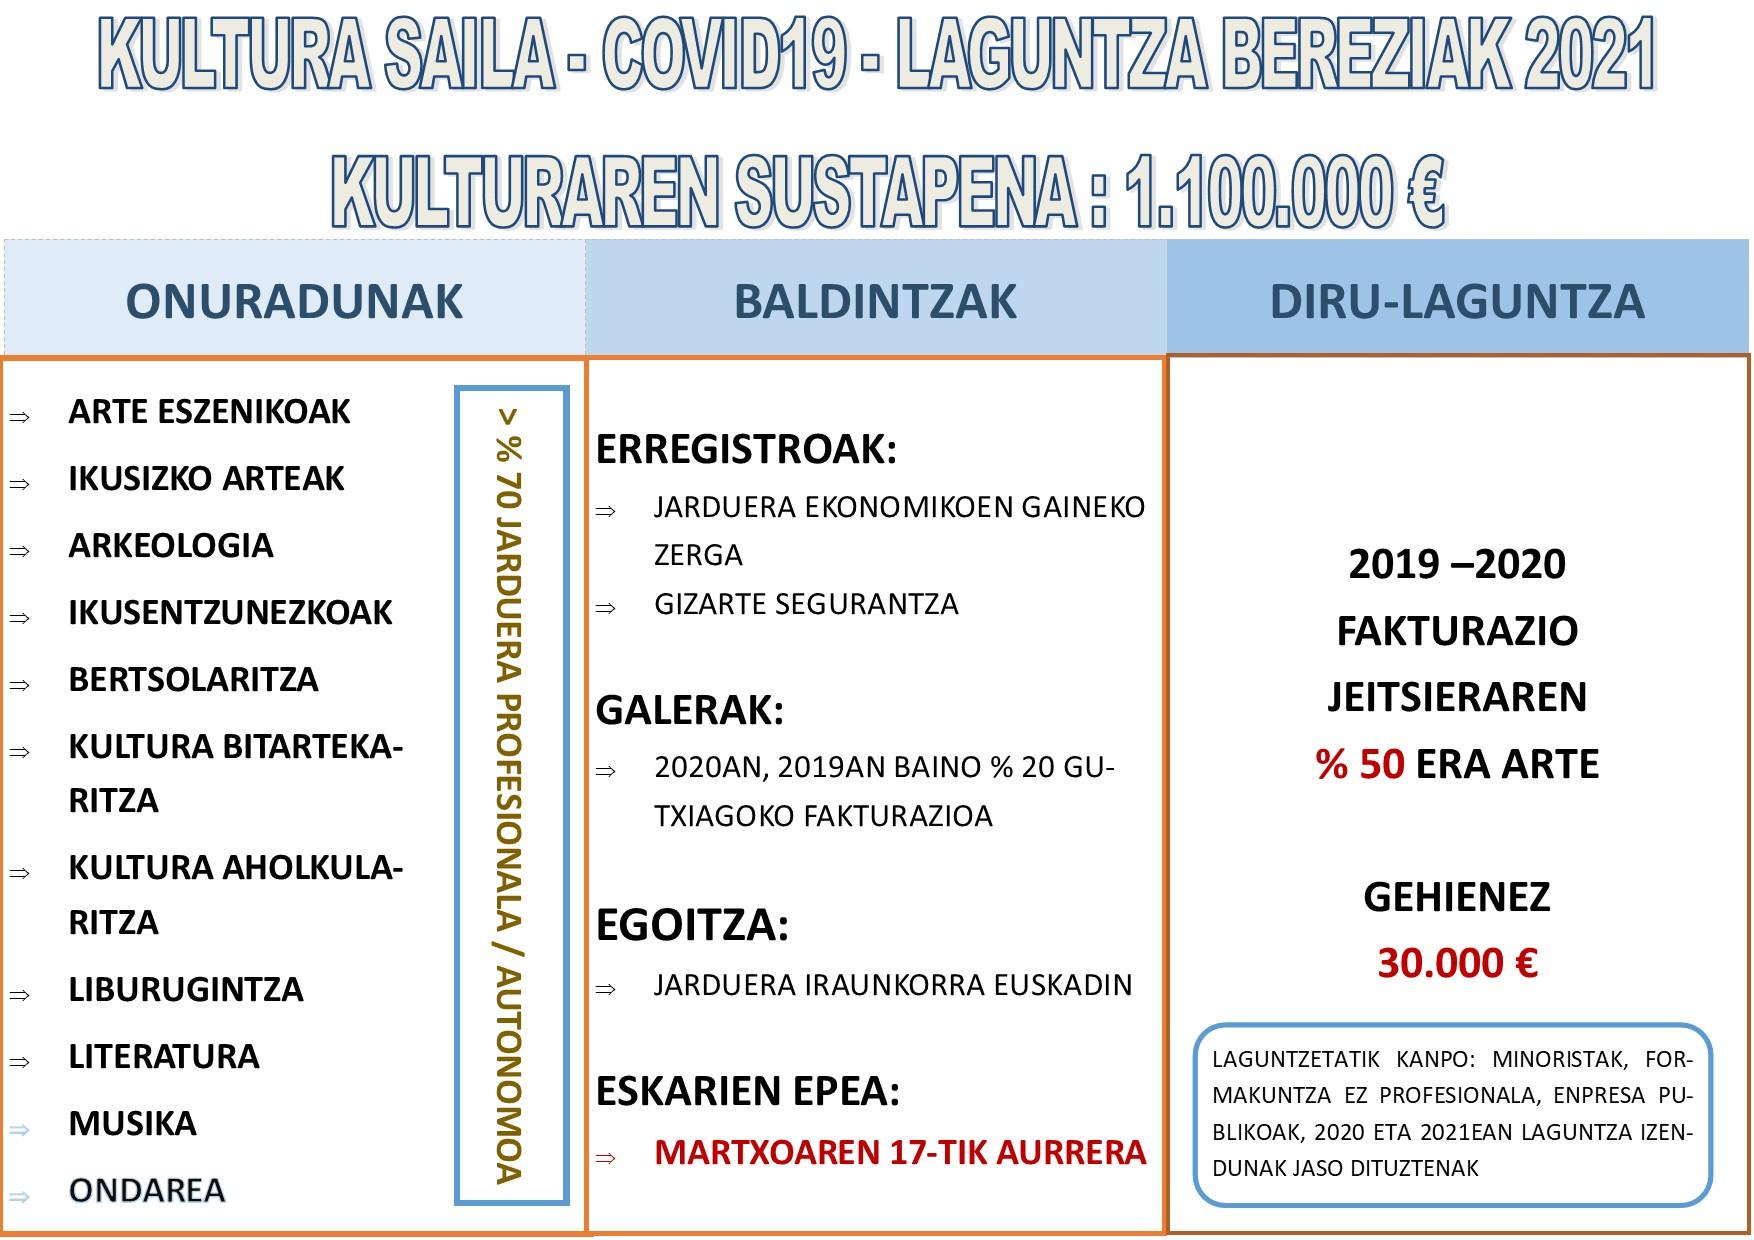 KULTURA_SAILA_COVID_19_LAGUNTZAK_2021_EUSK.jpg